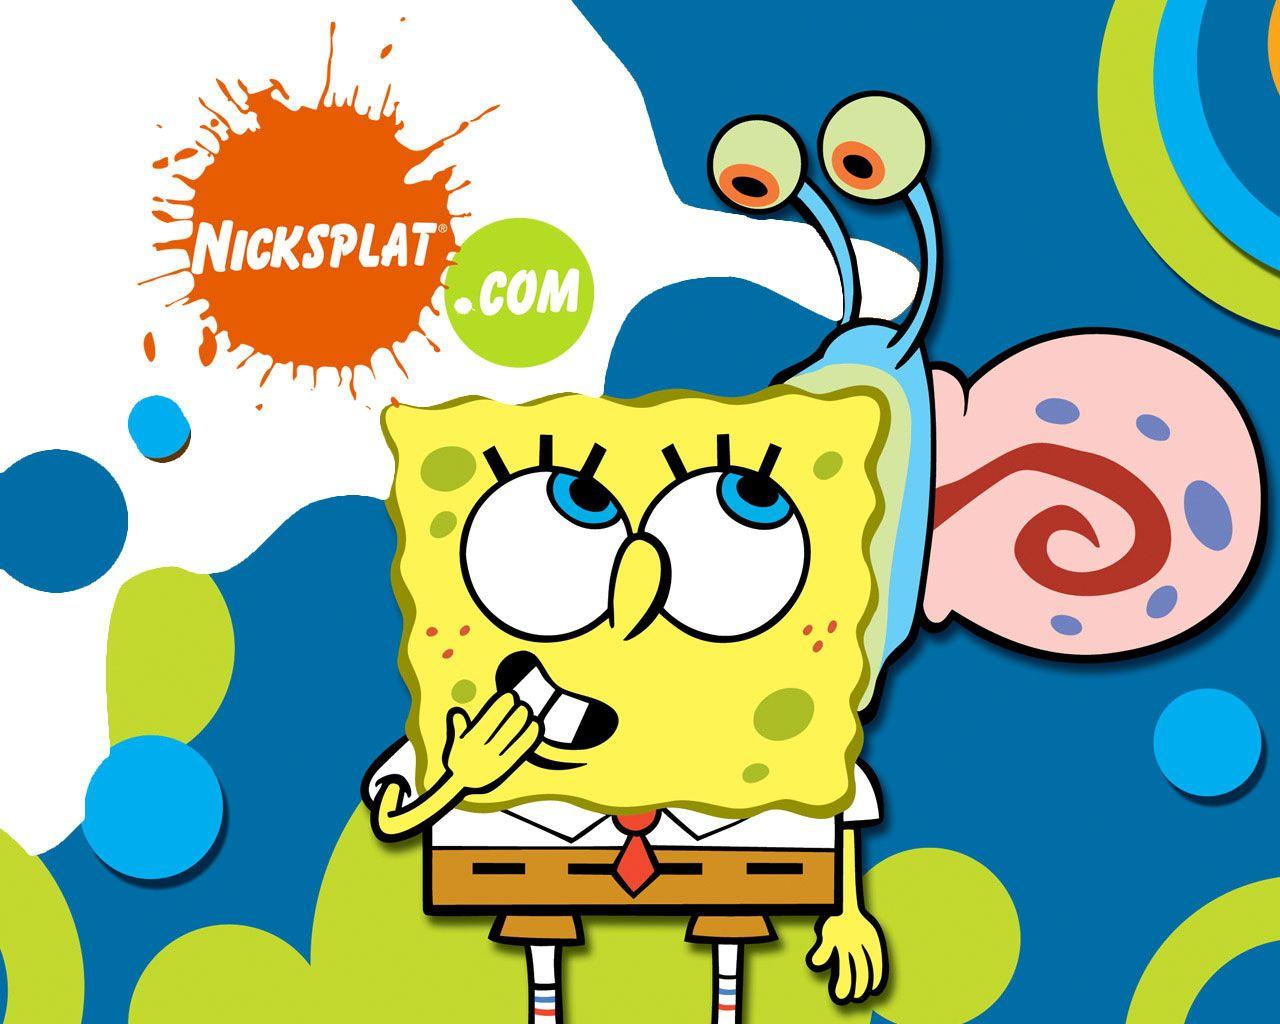 Gary And Spongebob Wallpaper Here You Can See Gary And Spongebob Wallpaper Or Download Picture Of Gary An Spongebob Spongebob Wallpaper Nickelodeon Spongebob